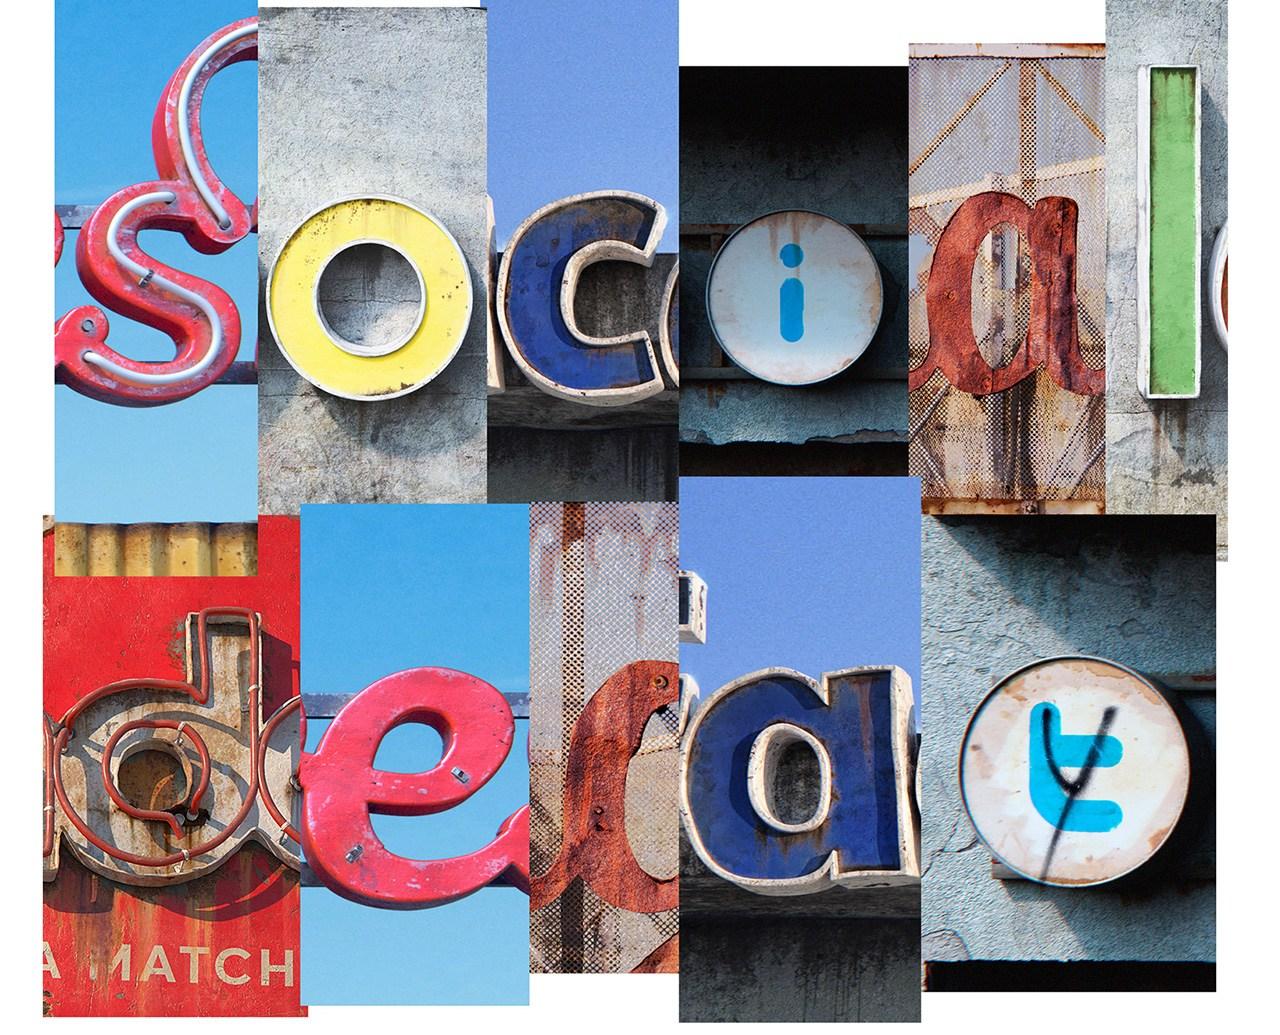 AndreiLacatusu social decay lettres logo enseigne typographie urbain urbex - Social decay : les logos de Twitter, Facebook et Tinder transformés en enseignes vintage